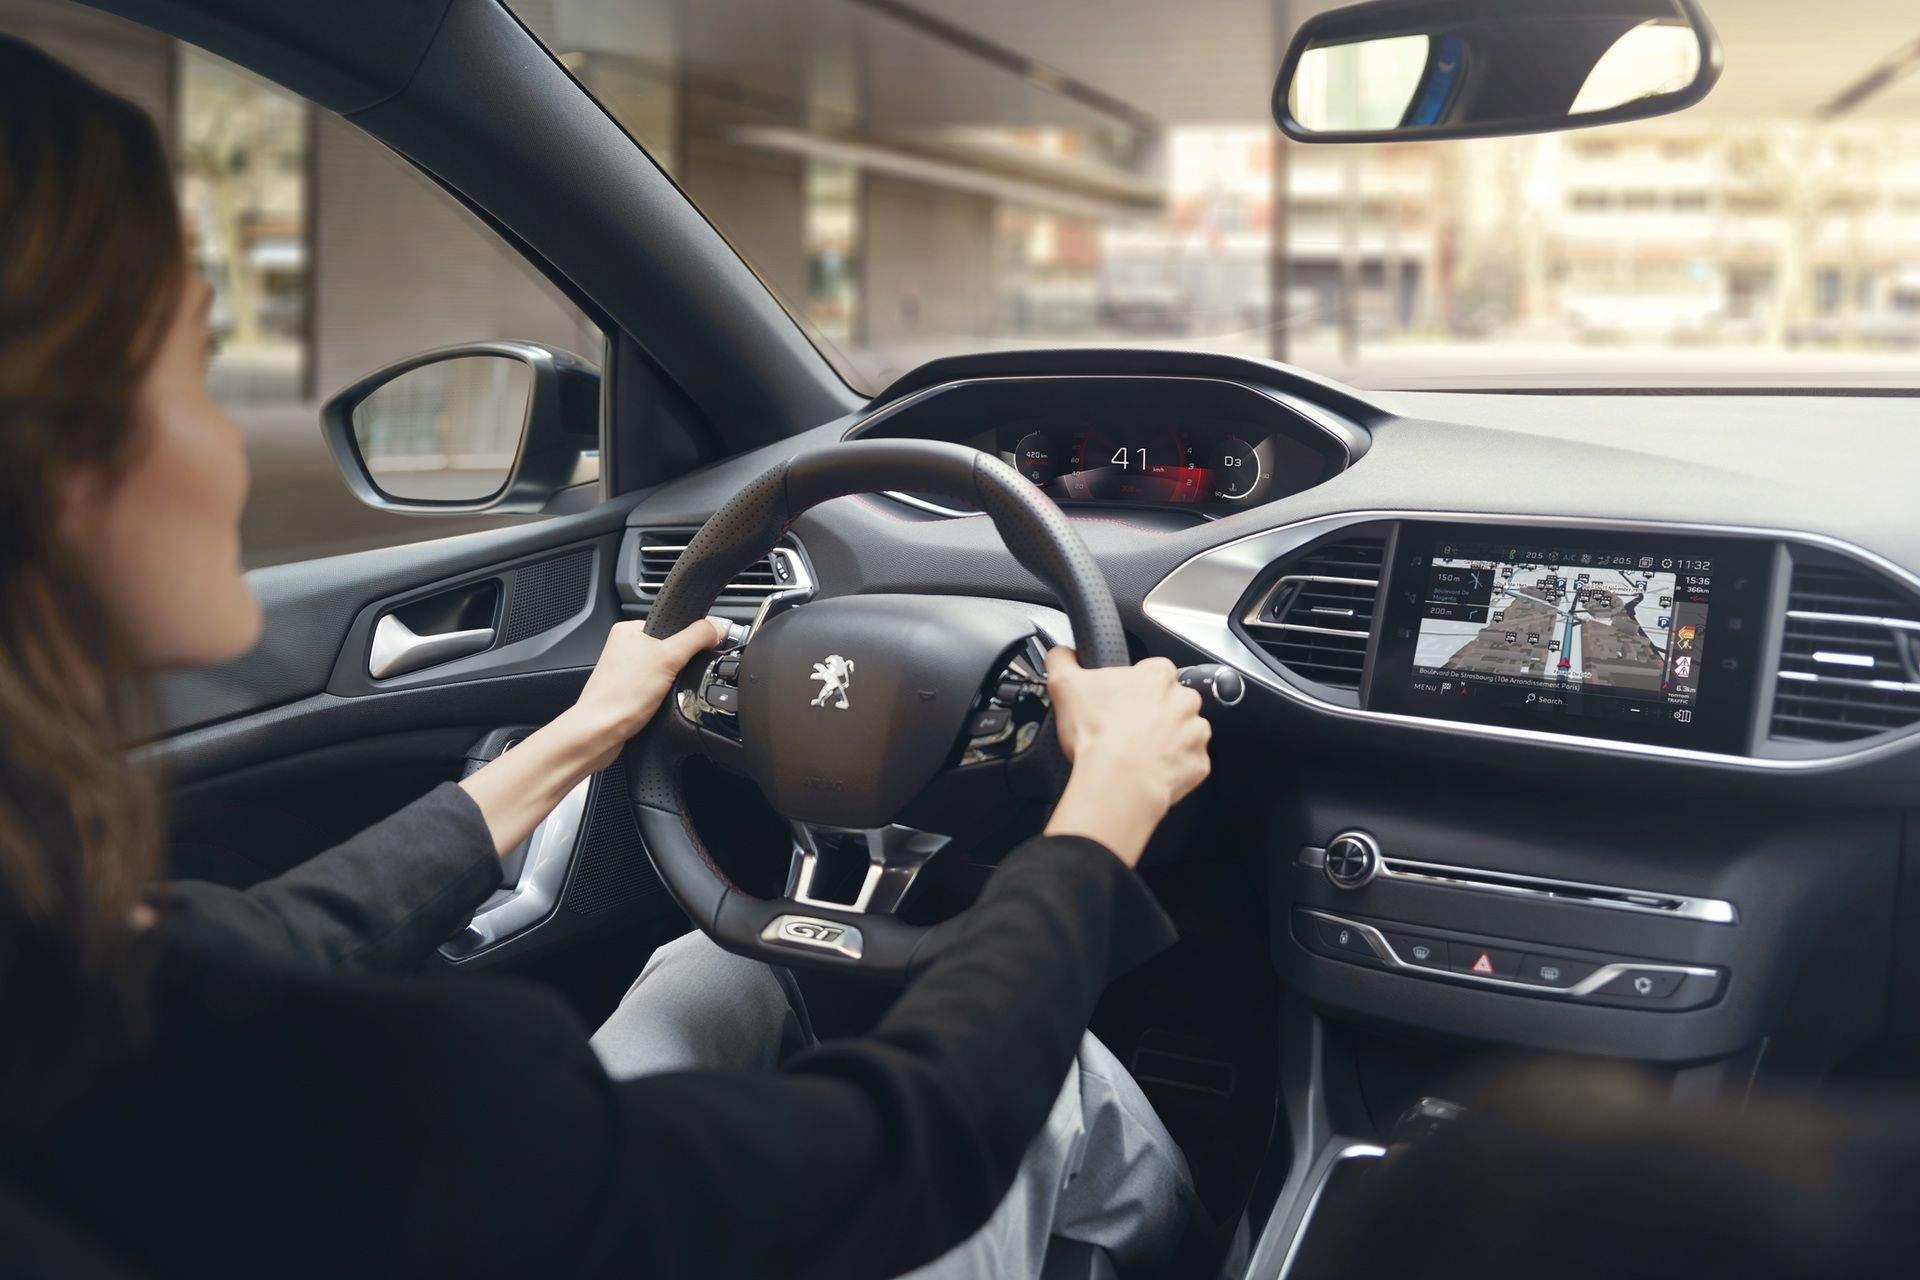 2020_Peugeot_308_facelift_0006